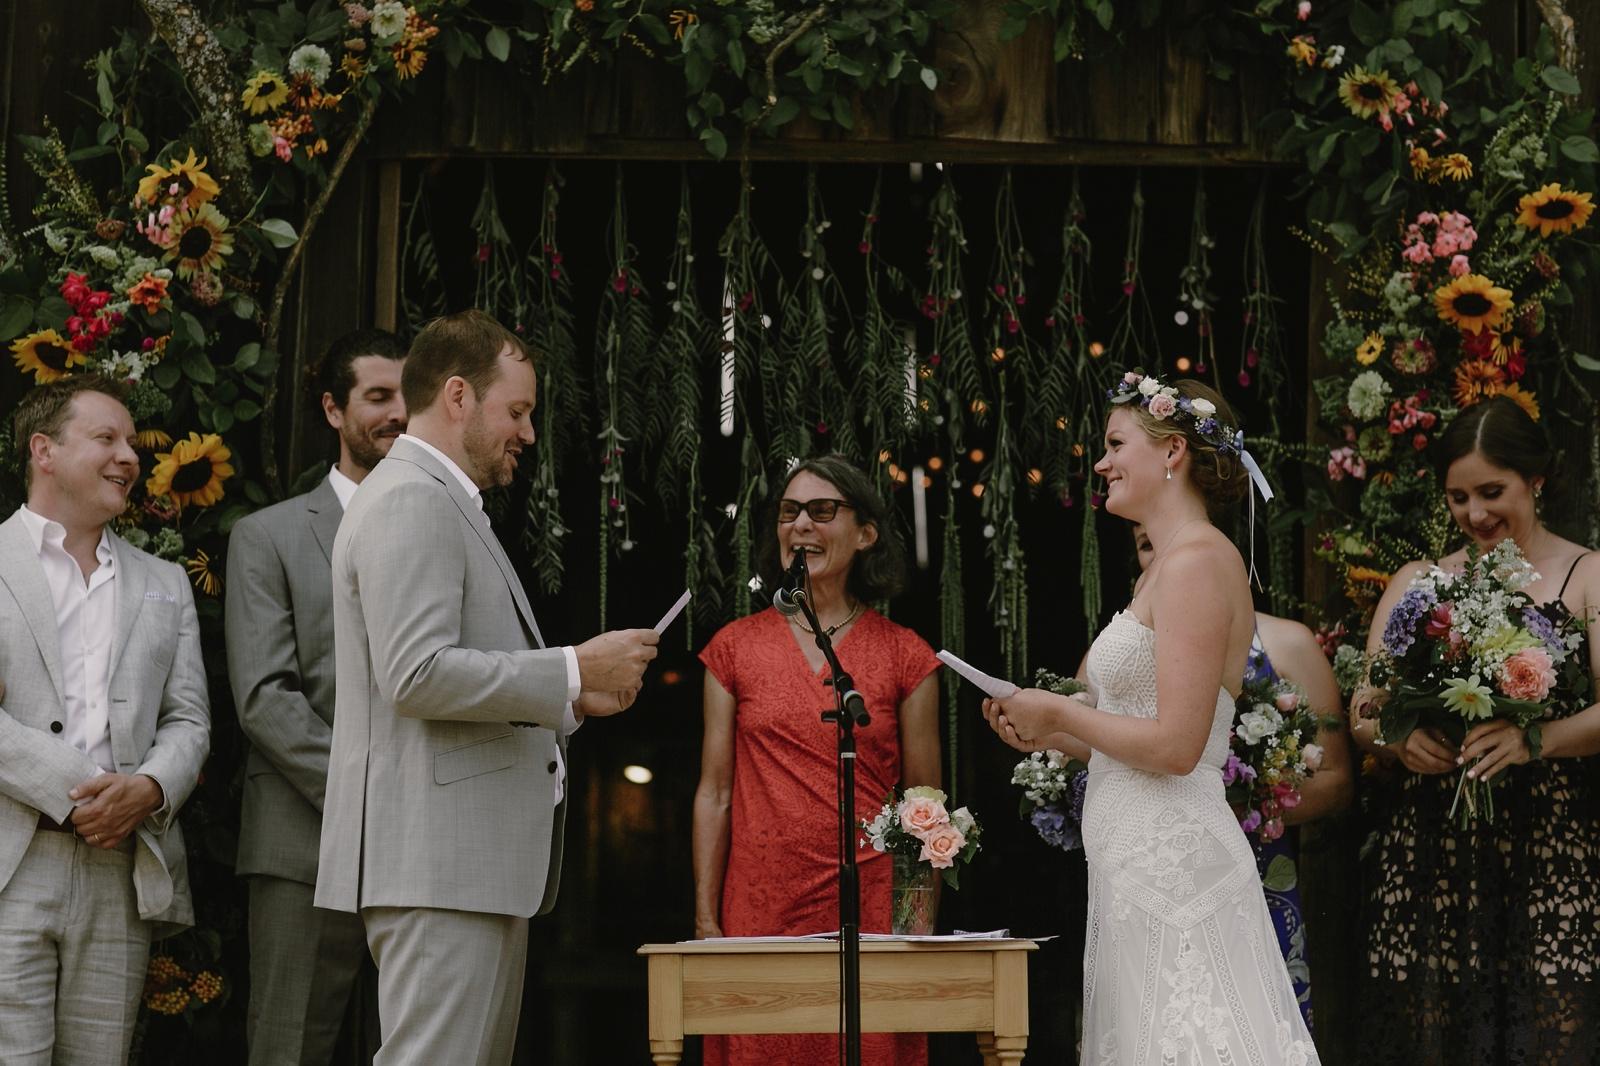 Backyard_Vashon_Island_Wedding_Kristen_Marie_Parker044.JPG